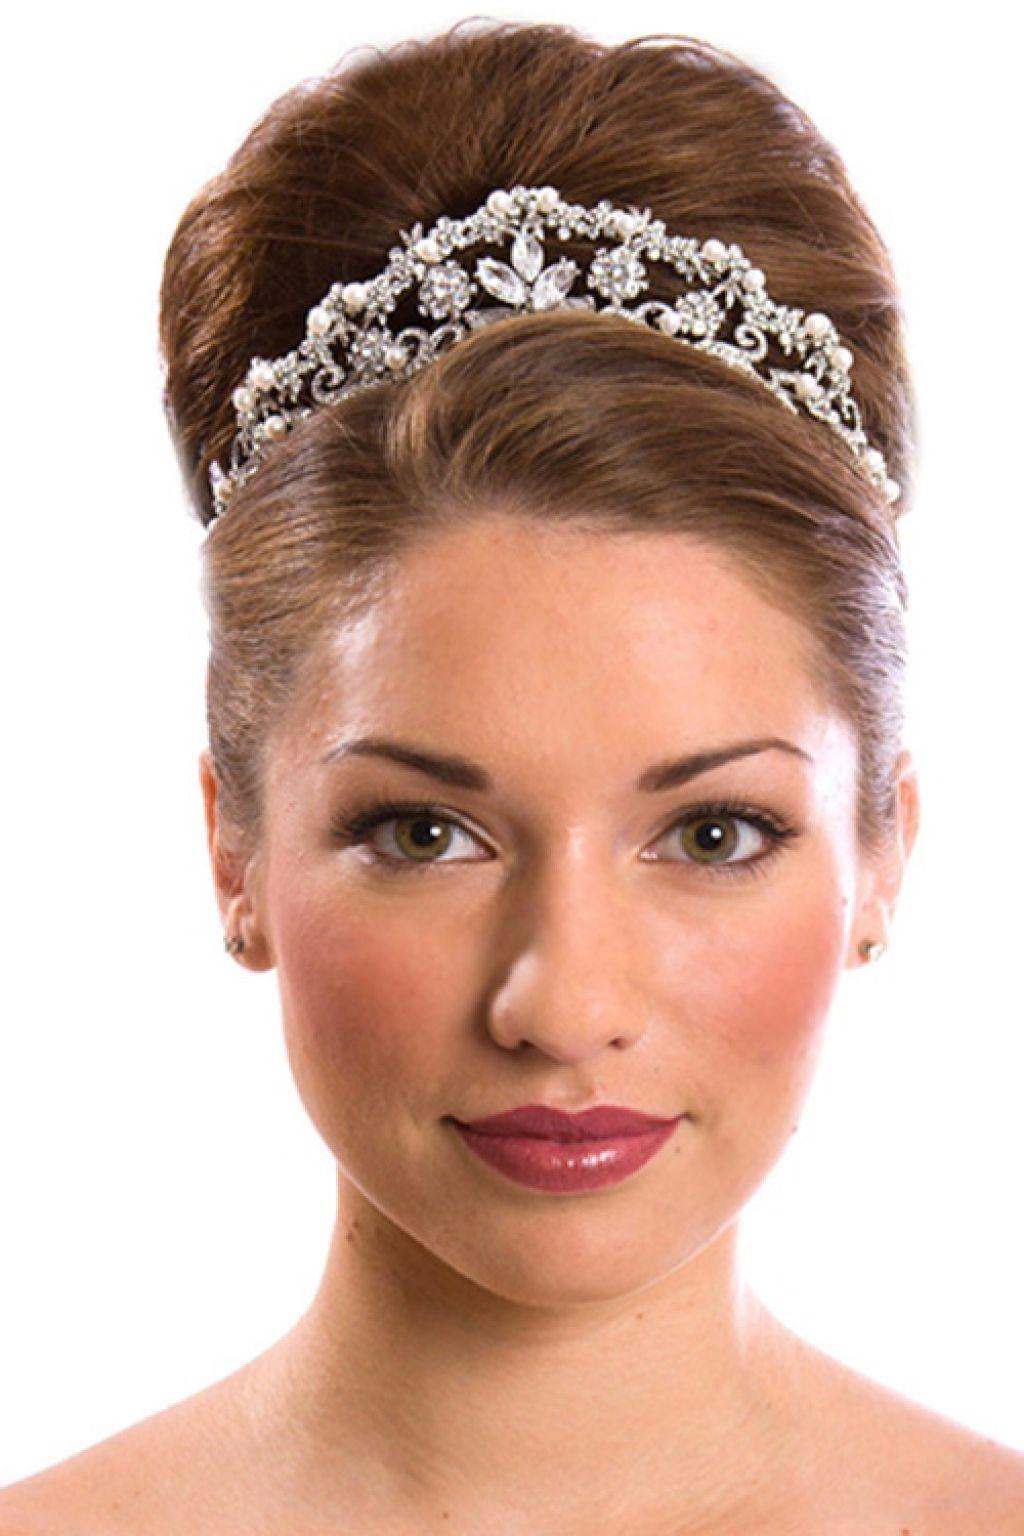 Wedding Hairstyles With Tiara Updo Tiara Hairstyles Wedding Hairstyles Bride Long Hair Styles